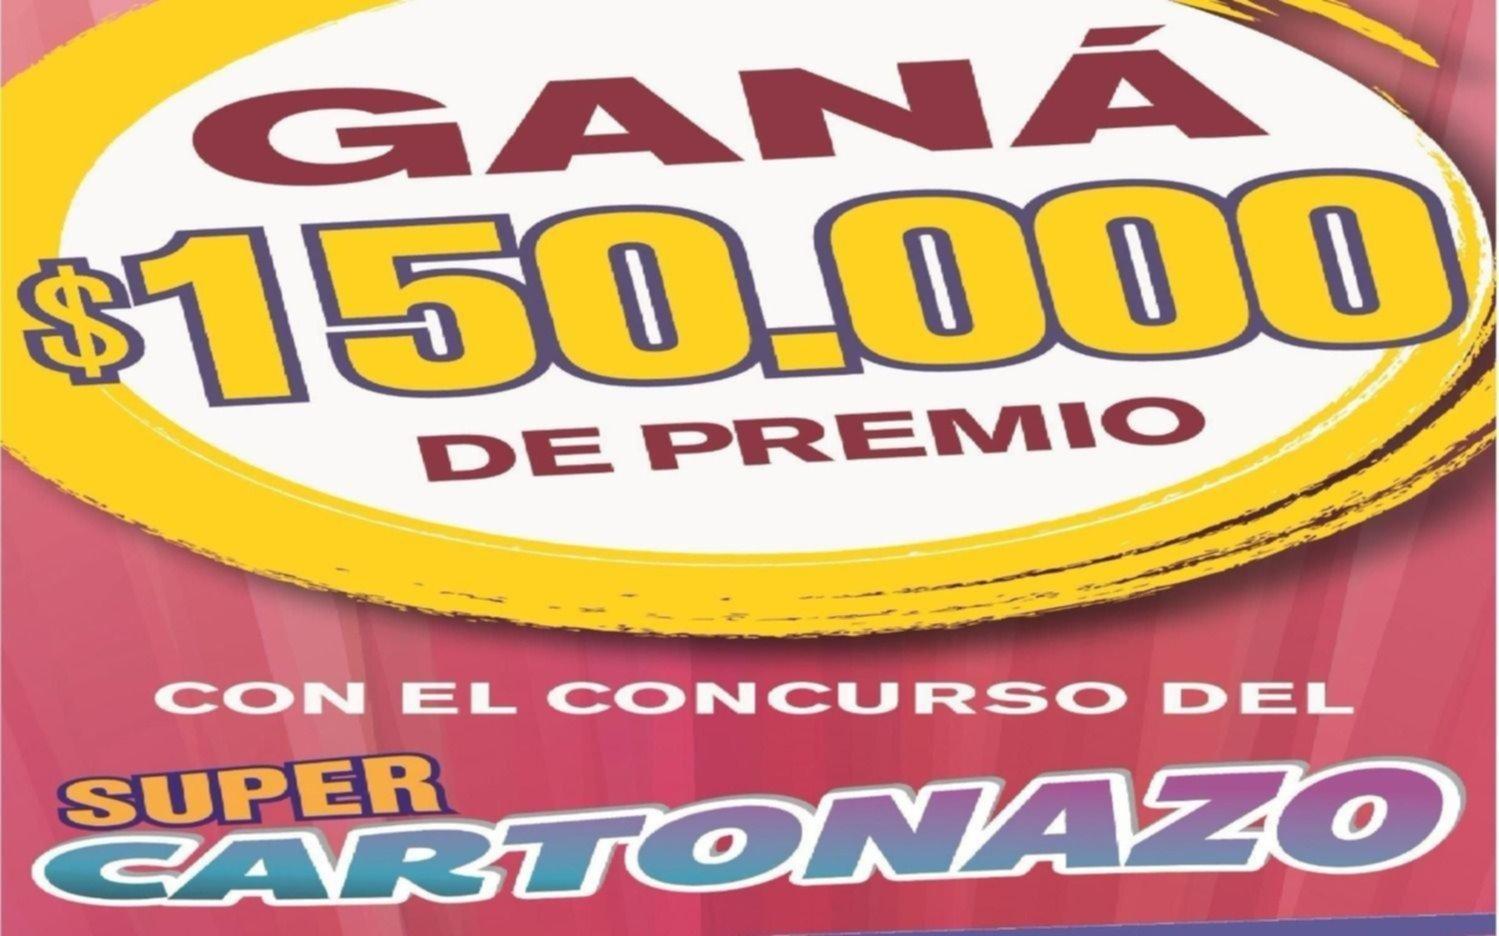 Controlá El Cartonazo, podés ganar $150.000